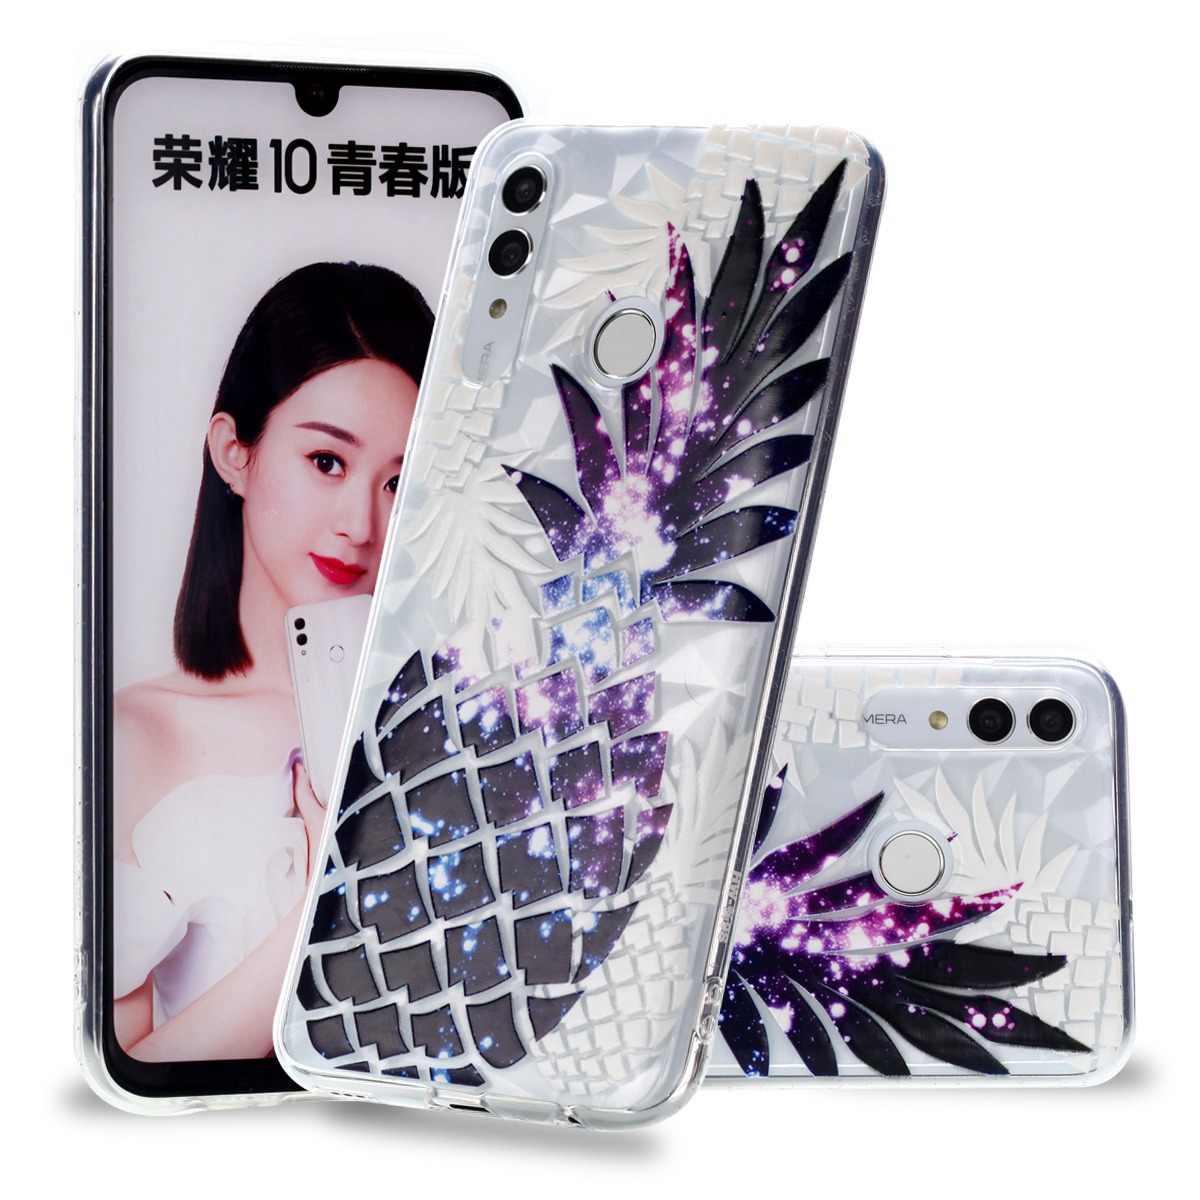 Funda para Huawei Honor 10i/P Smart Plus 2019 suave TPU funda de silicona para Huawei Honor10i/PSmart Plus /bolsa de fundas P SmartPlus SmartP